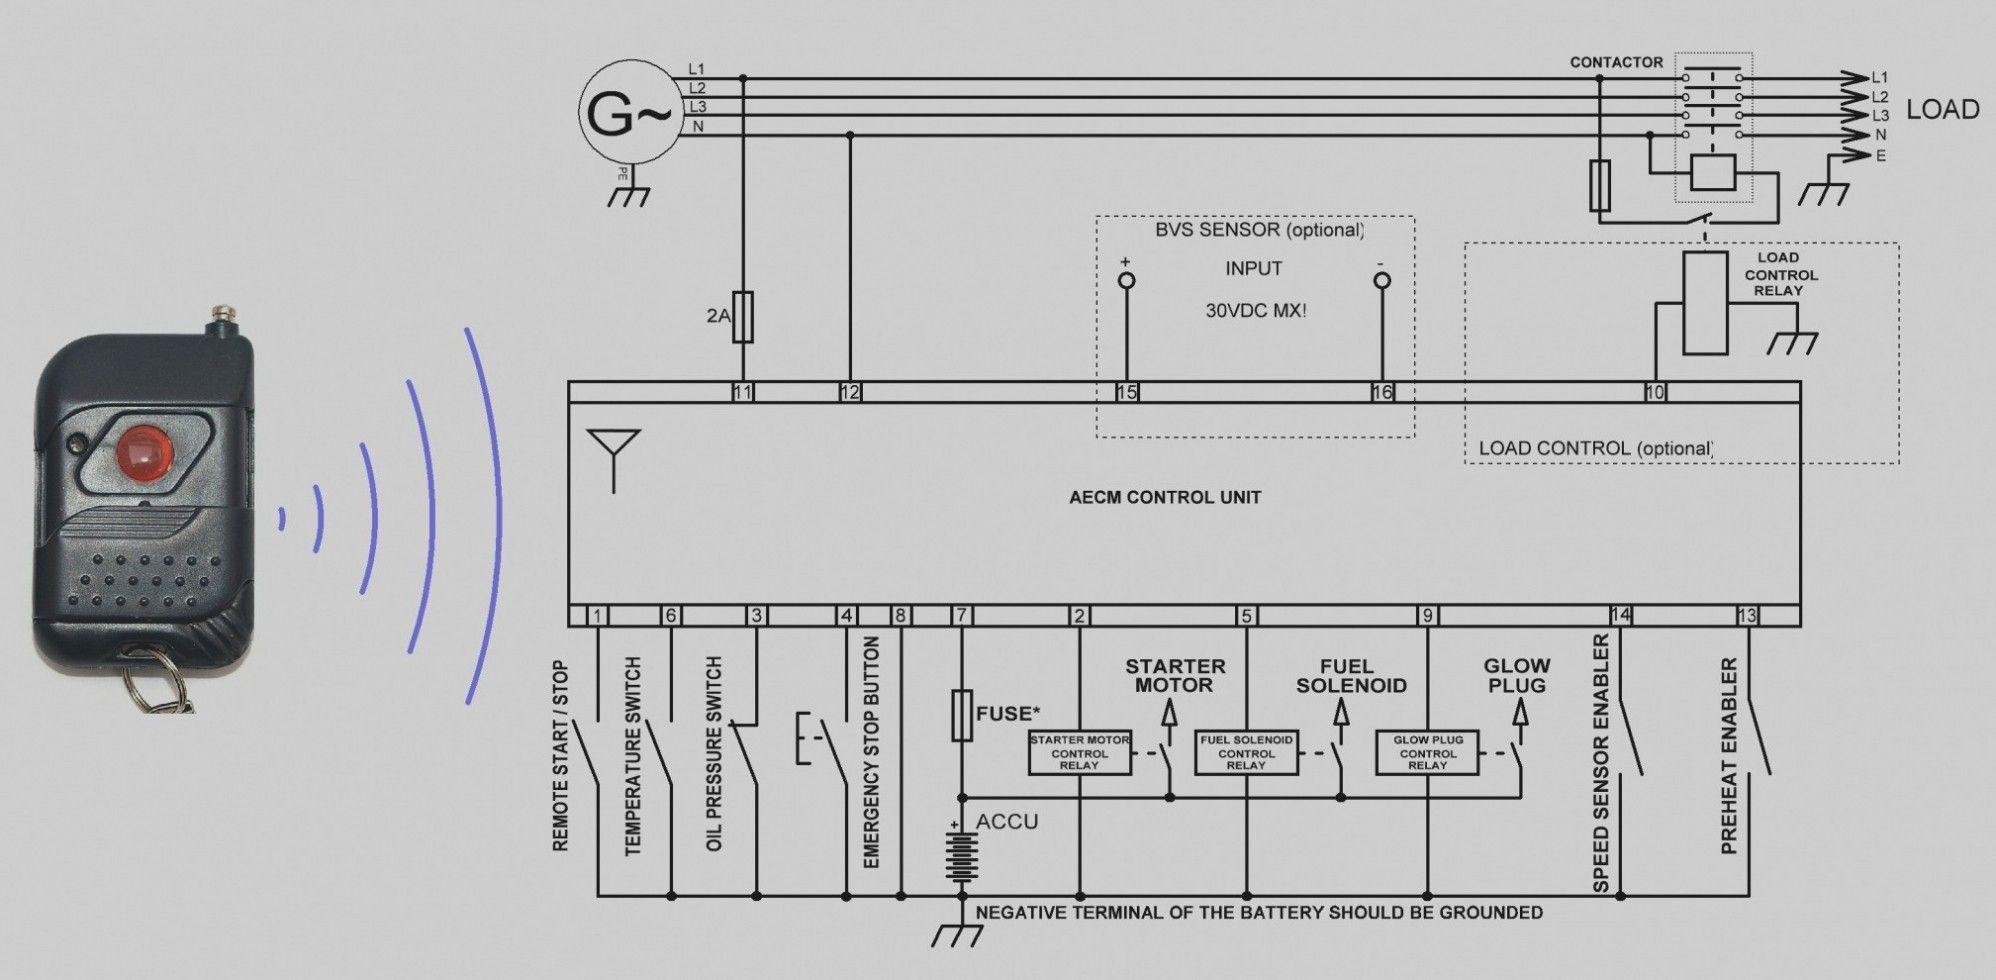 small resolution of unique electric fan motor wiring diagram pdf diagram diagramsample diagramtemplate wiringdiagram diagramchart worksheet worksheettemplate